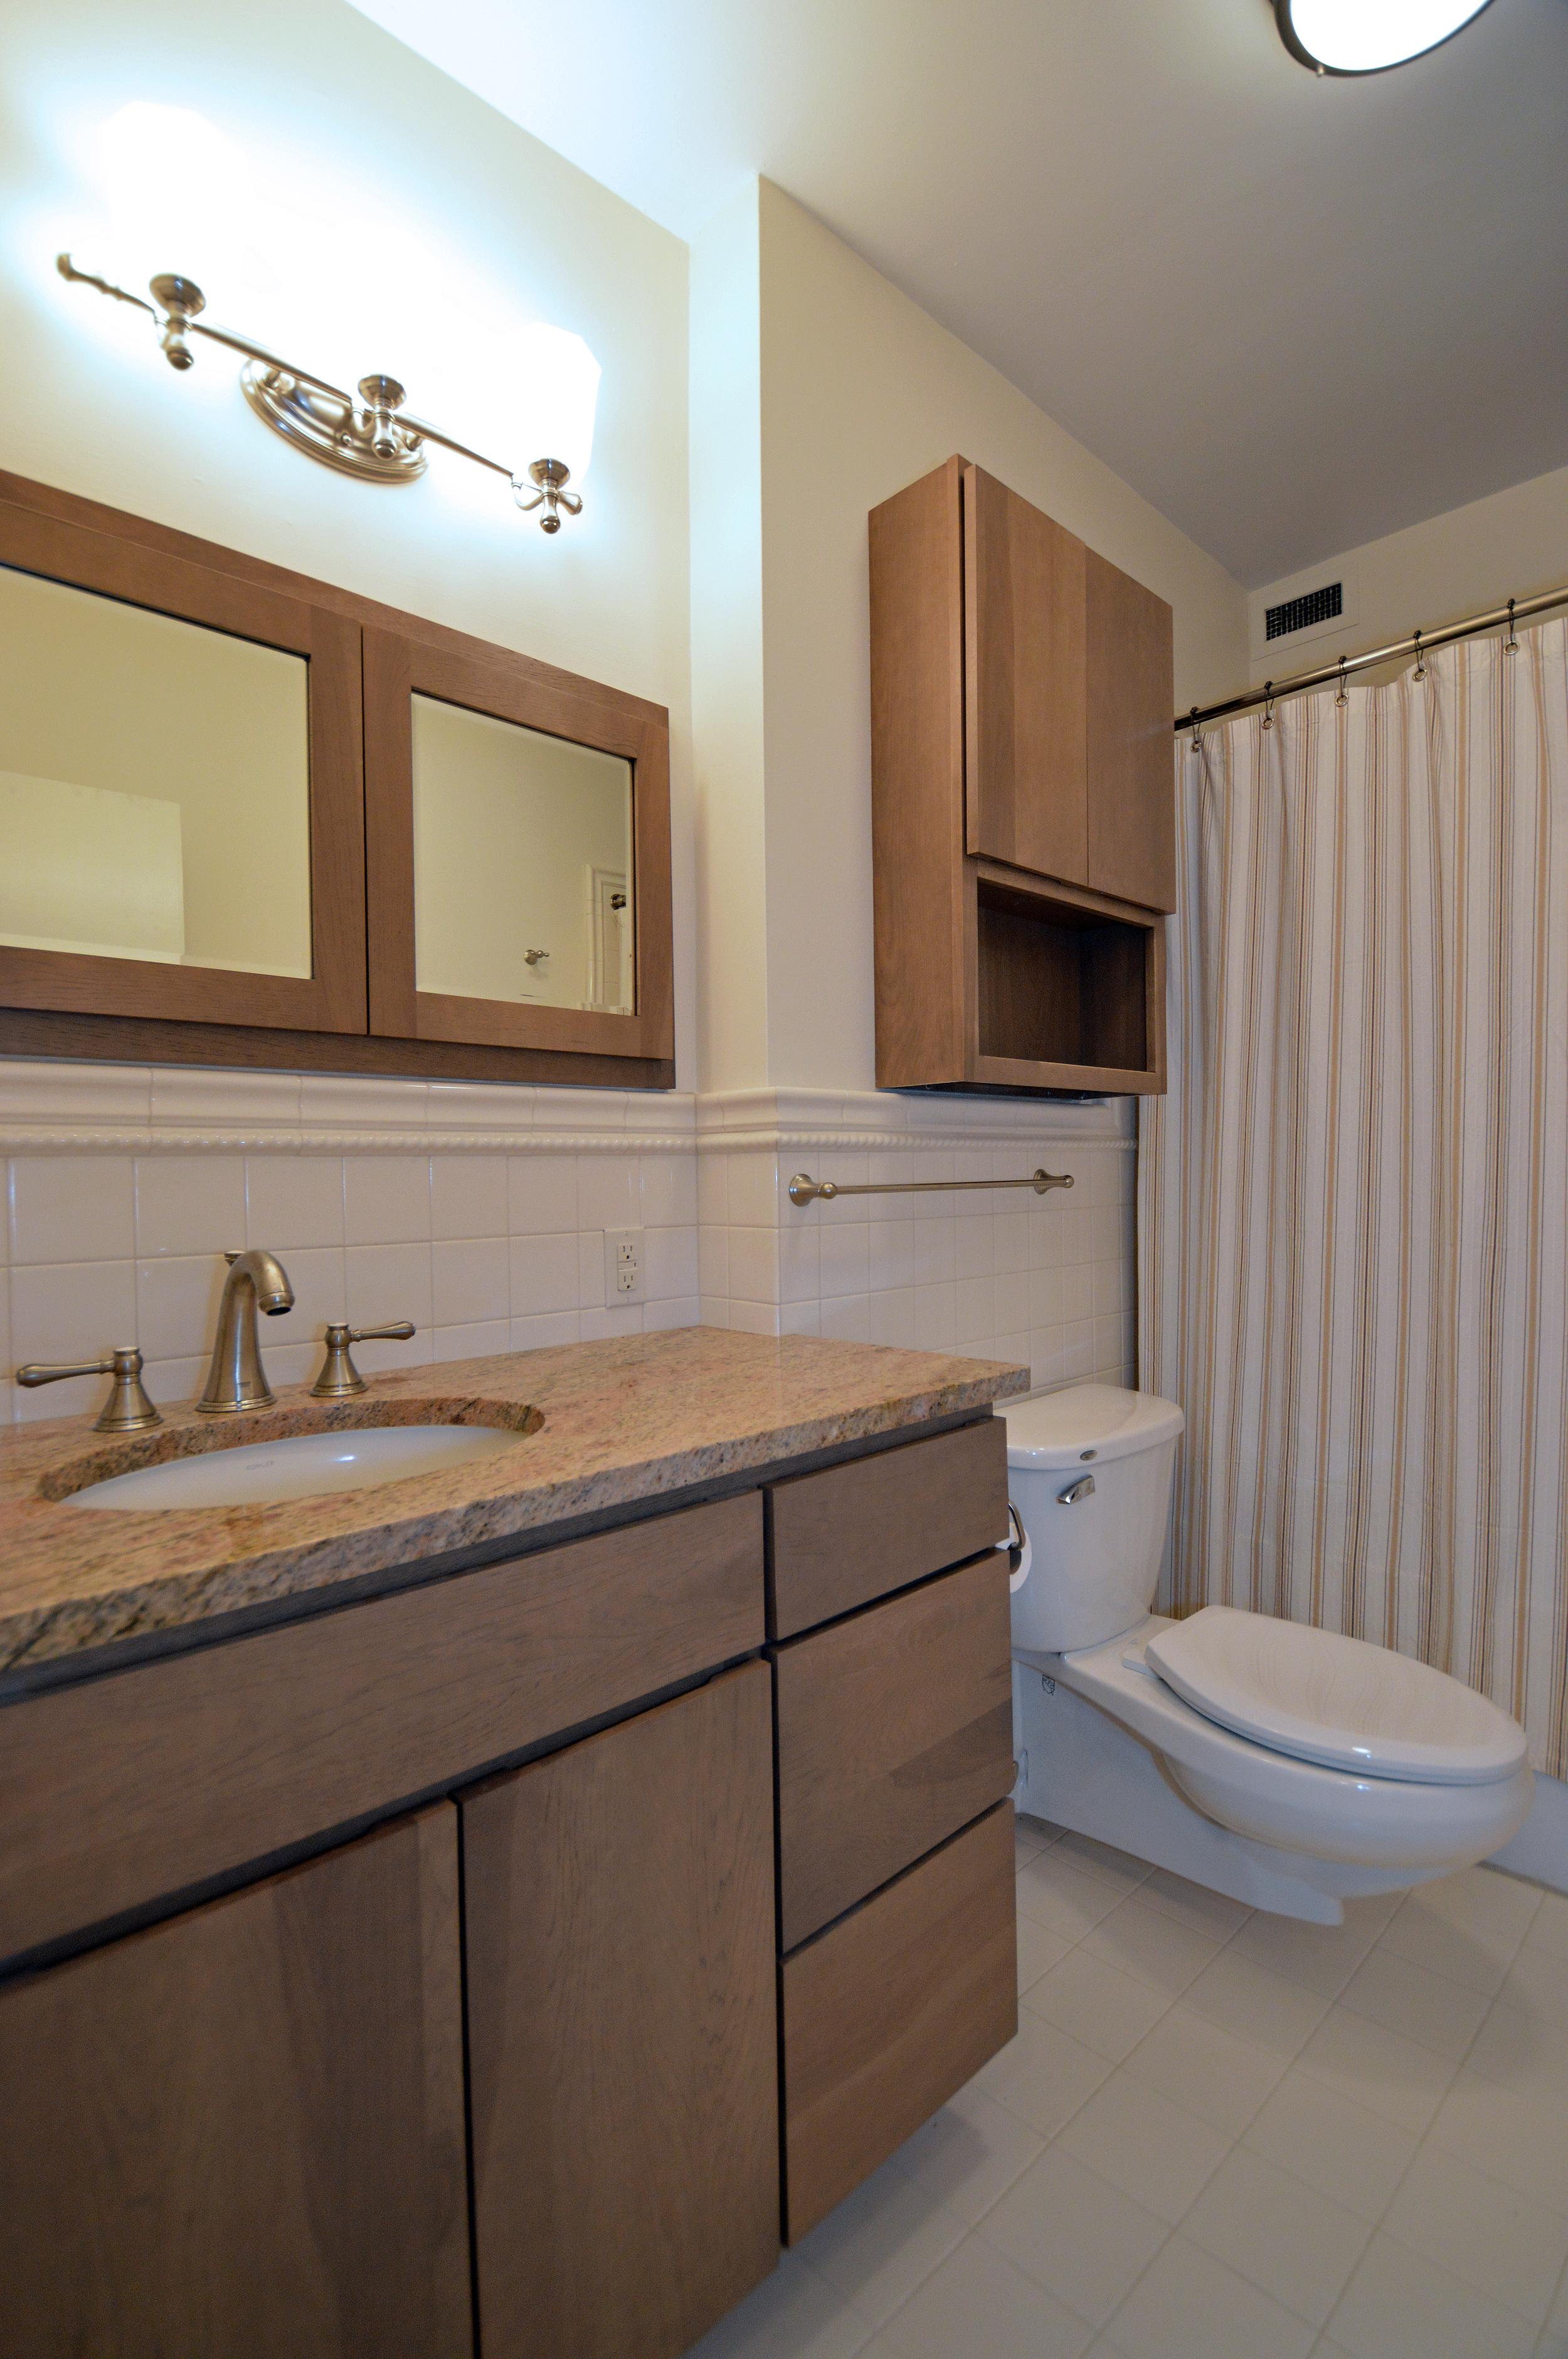 Condo bathroom renovation in Philadelphia, PA